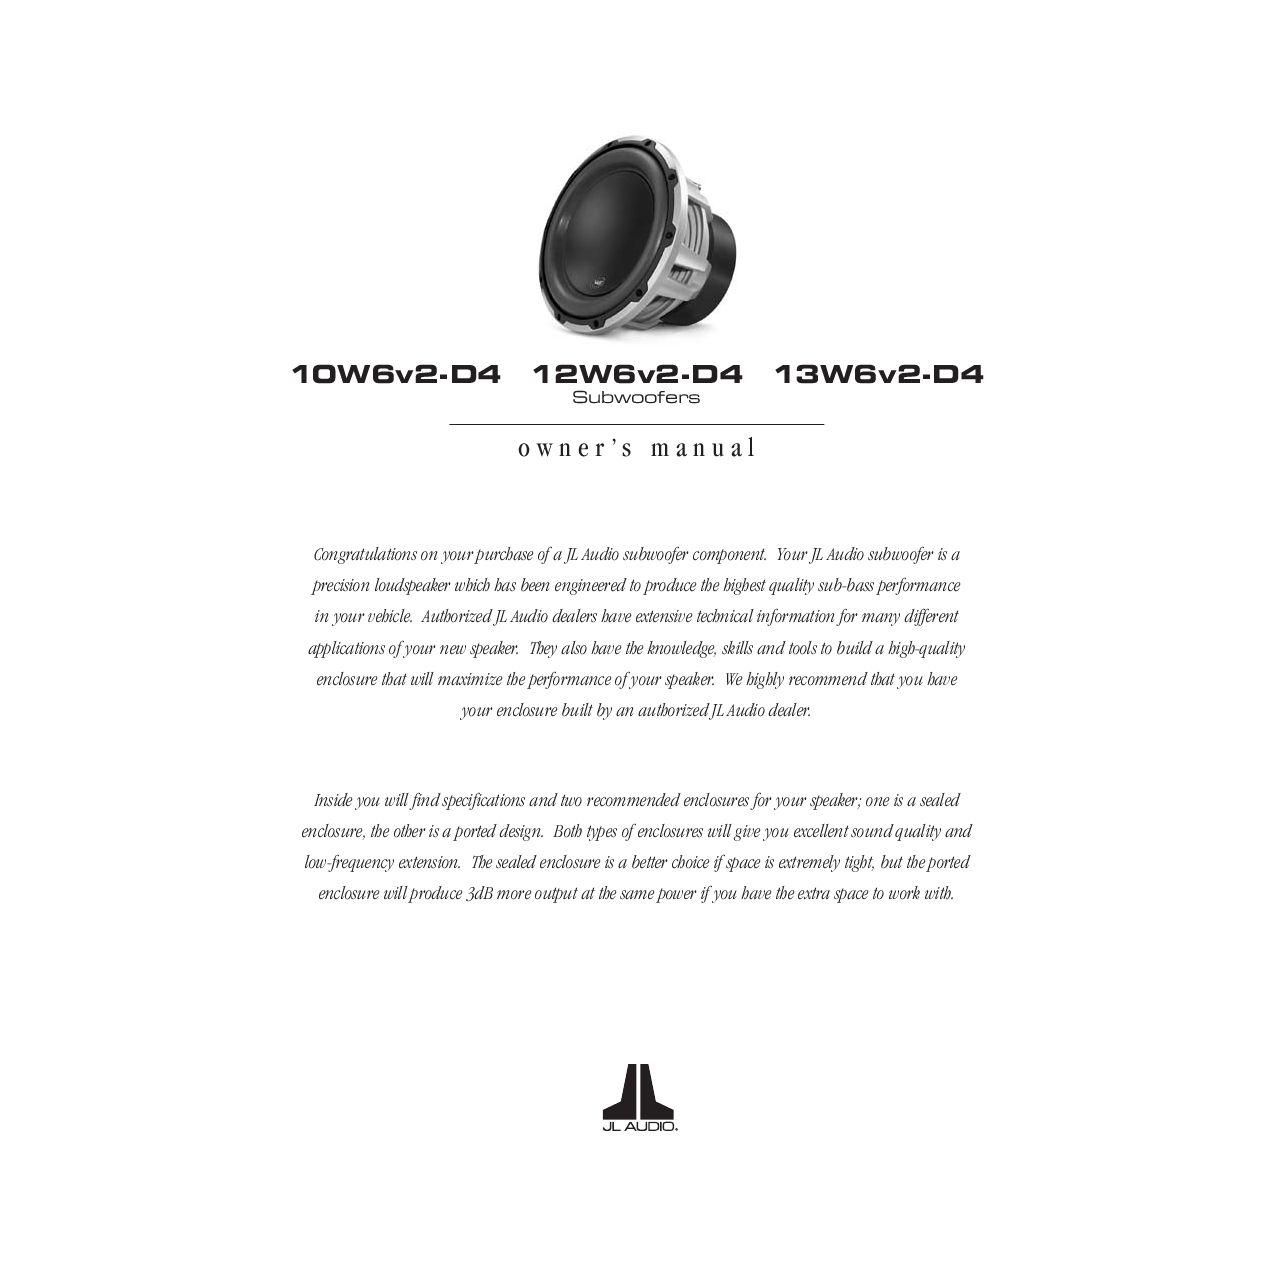 manual transmission fluid change cost